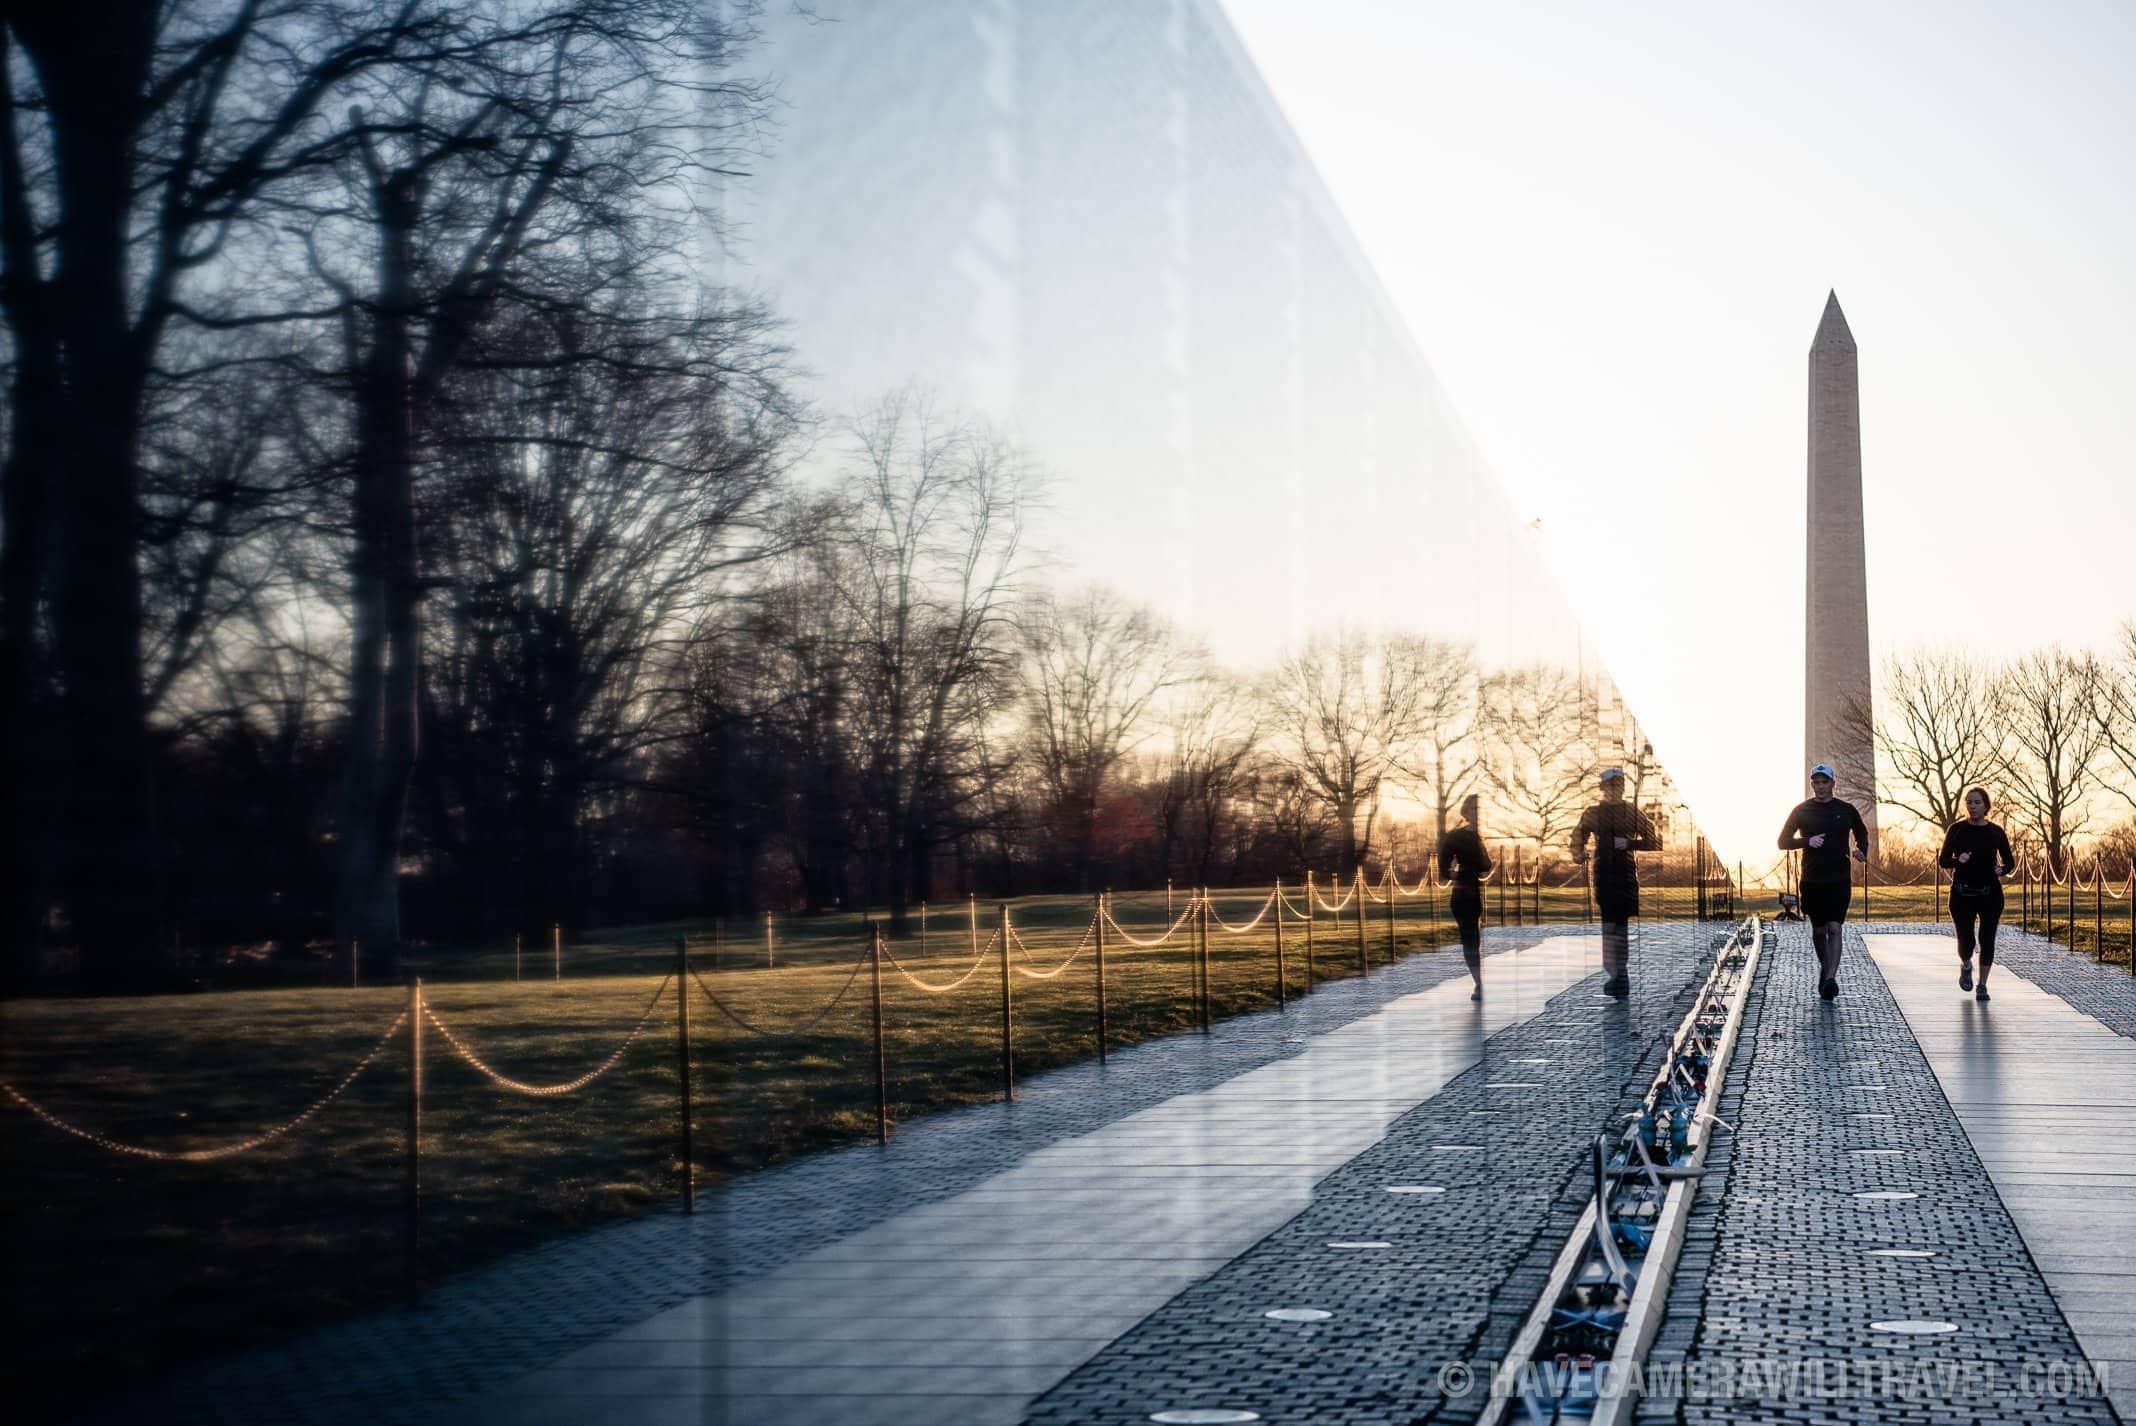 Vietnam Memorial, Washington DC, at Sunrise